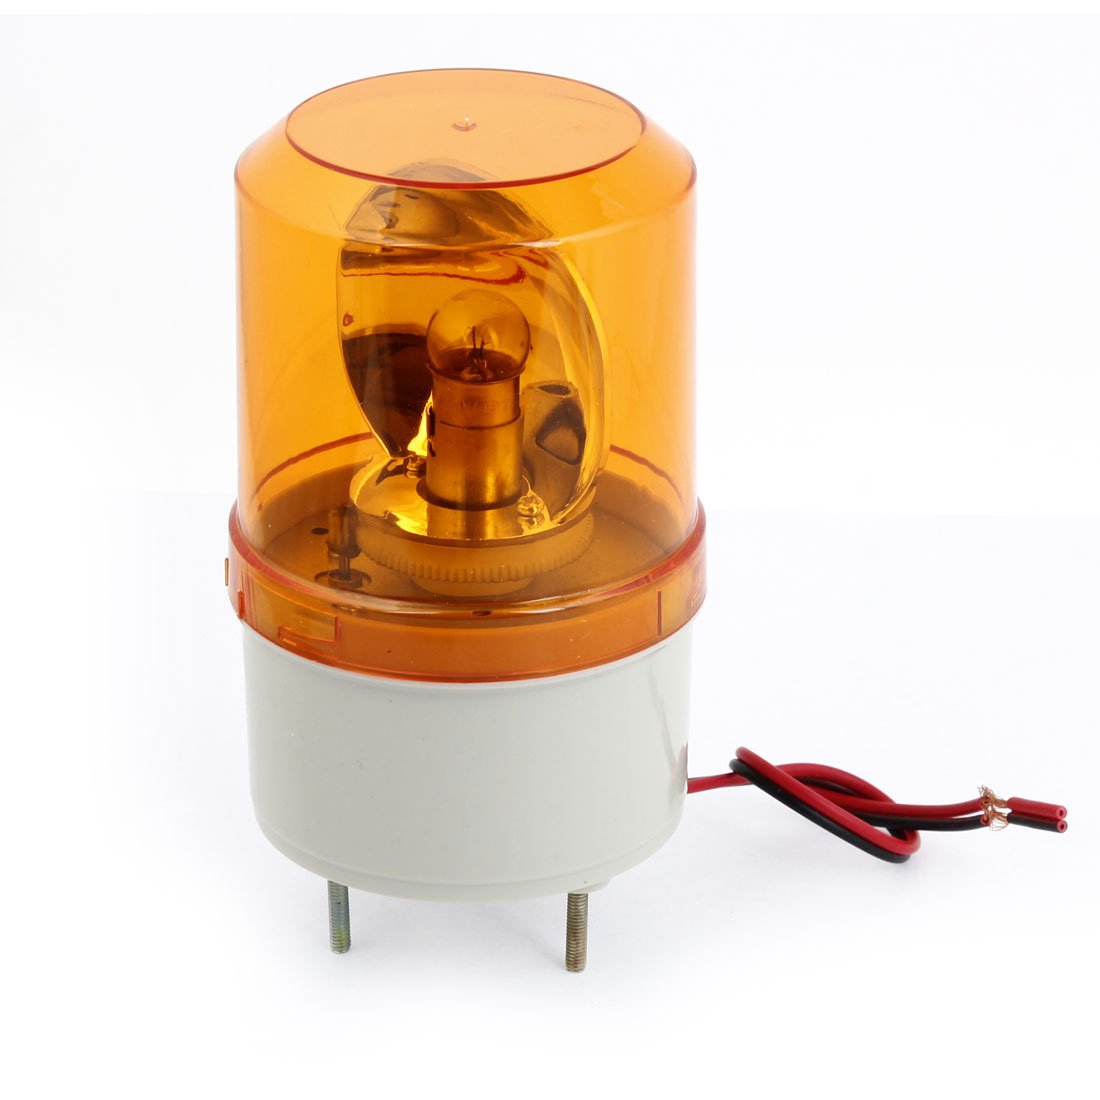 DC 24V 5W Flash Strobe Light Industrial Signal Warning Lamp Yellow